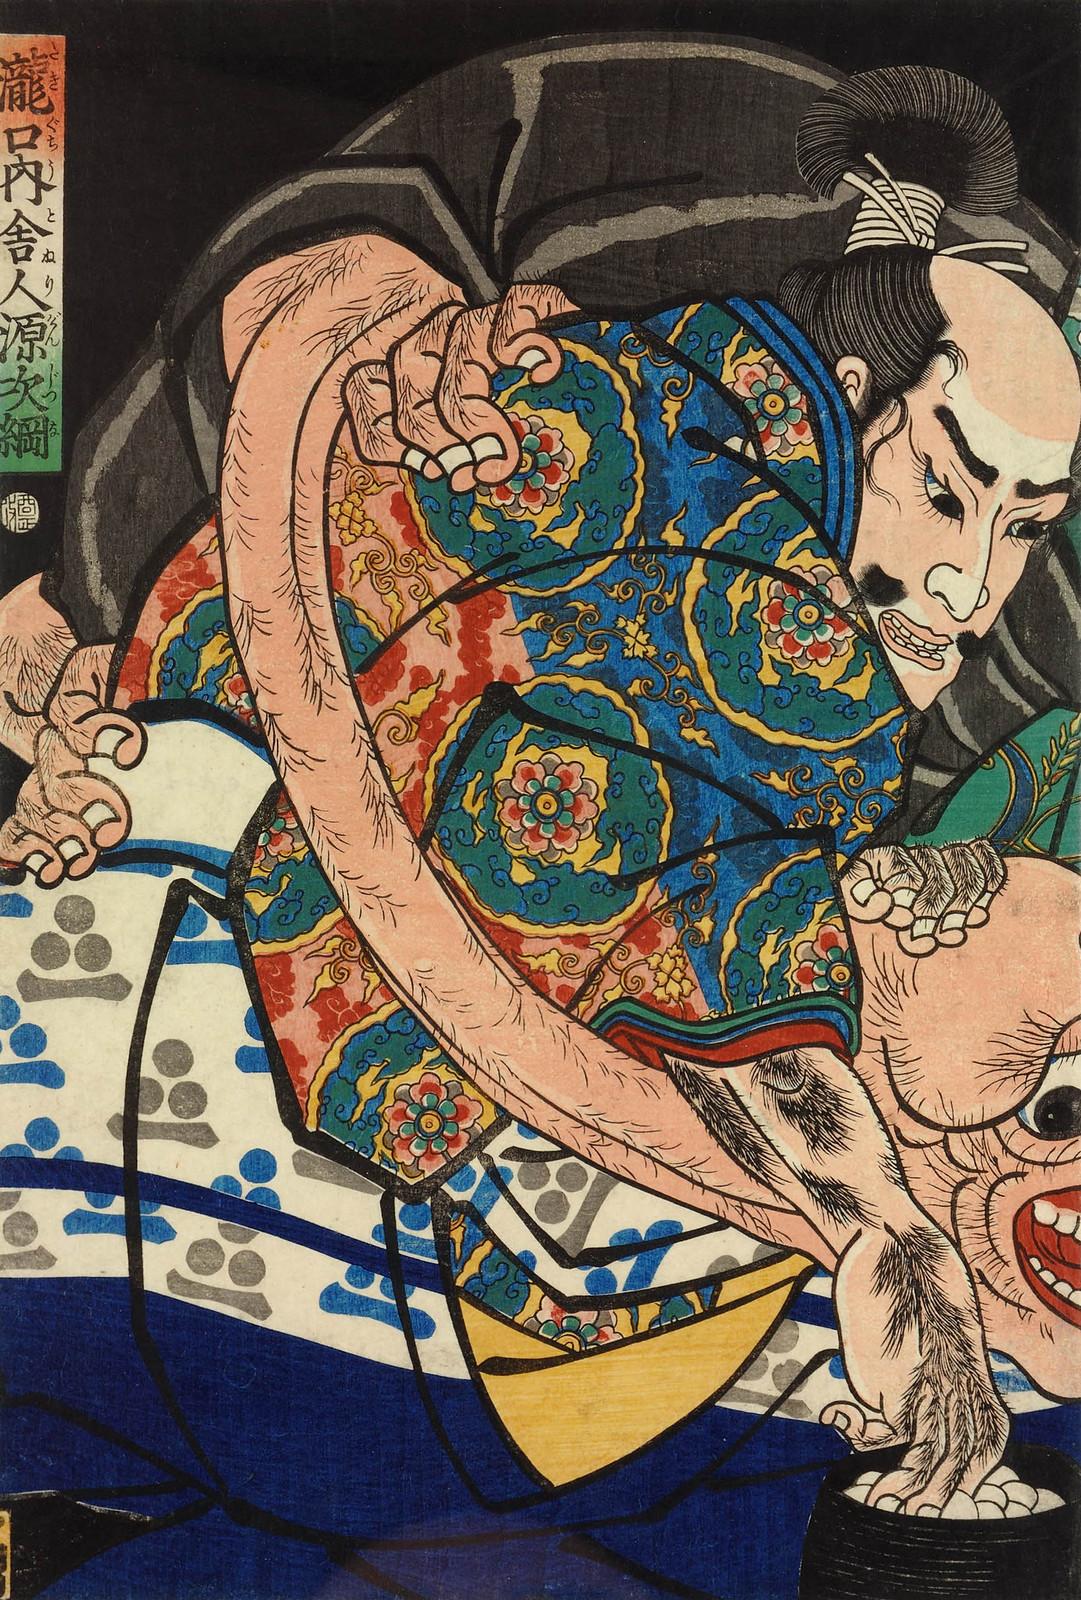 Utagawa Kuniyoshi - Raiko's retainers, Watanabe no Tonna, Sadanobu, and Kunitoki, playing go, with attempted interruptions by the Earth-Spider's demons. Edo Period (left panel)